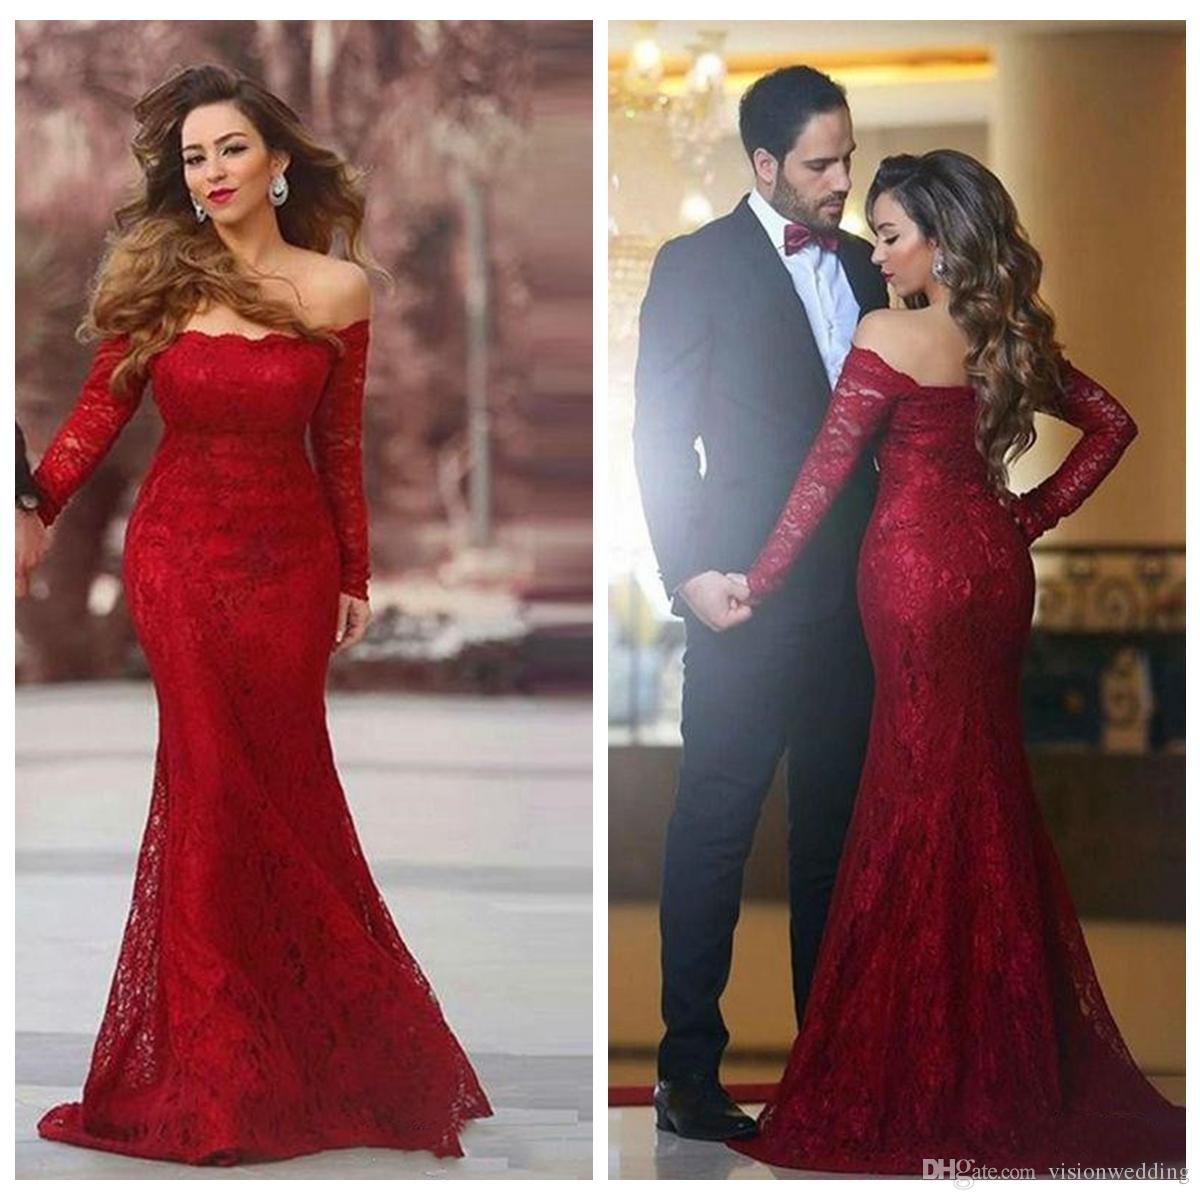 2228bd2ec81d Mermaid Red Prom Dresses 2019 Long Off Shoulder Lace Long Sleeve Floor  Length Vestidos De Fiesta Formal Party Cocktail Dress Evening Gowns Prom  Dresses ...